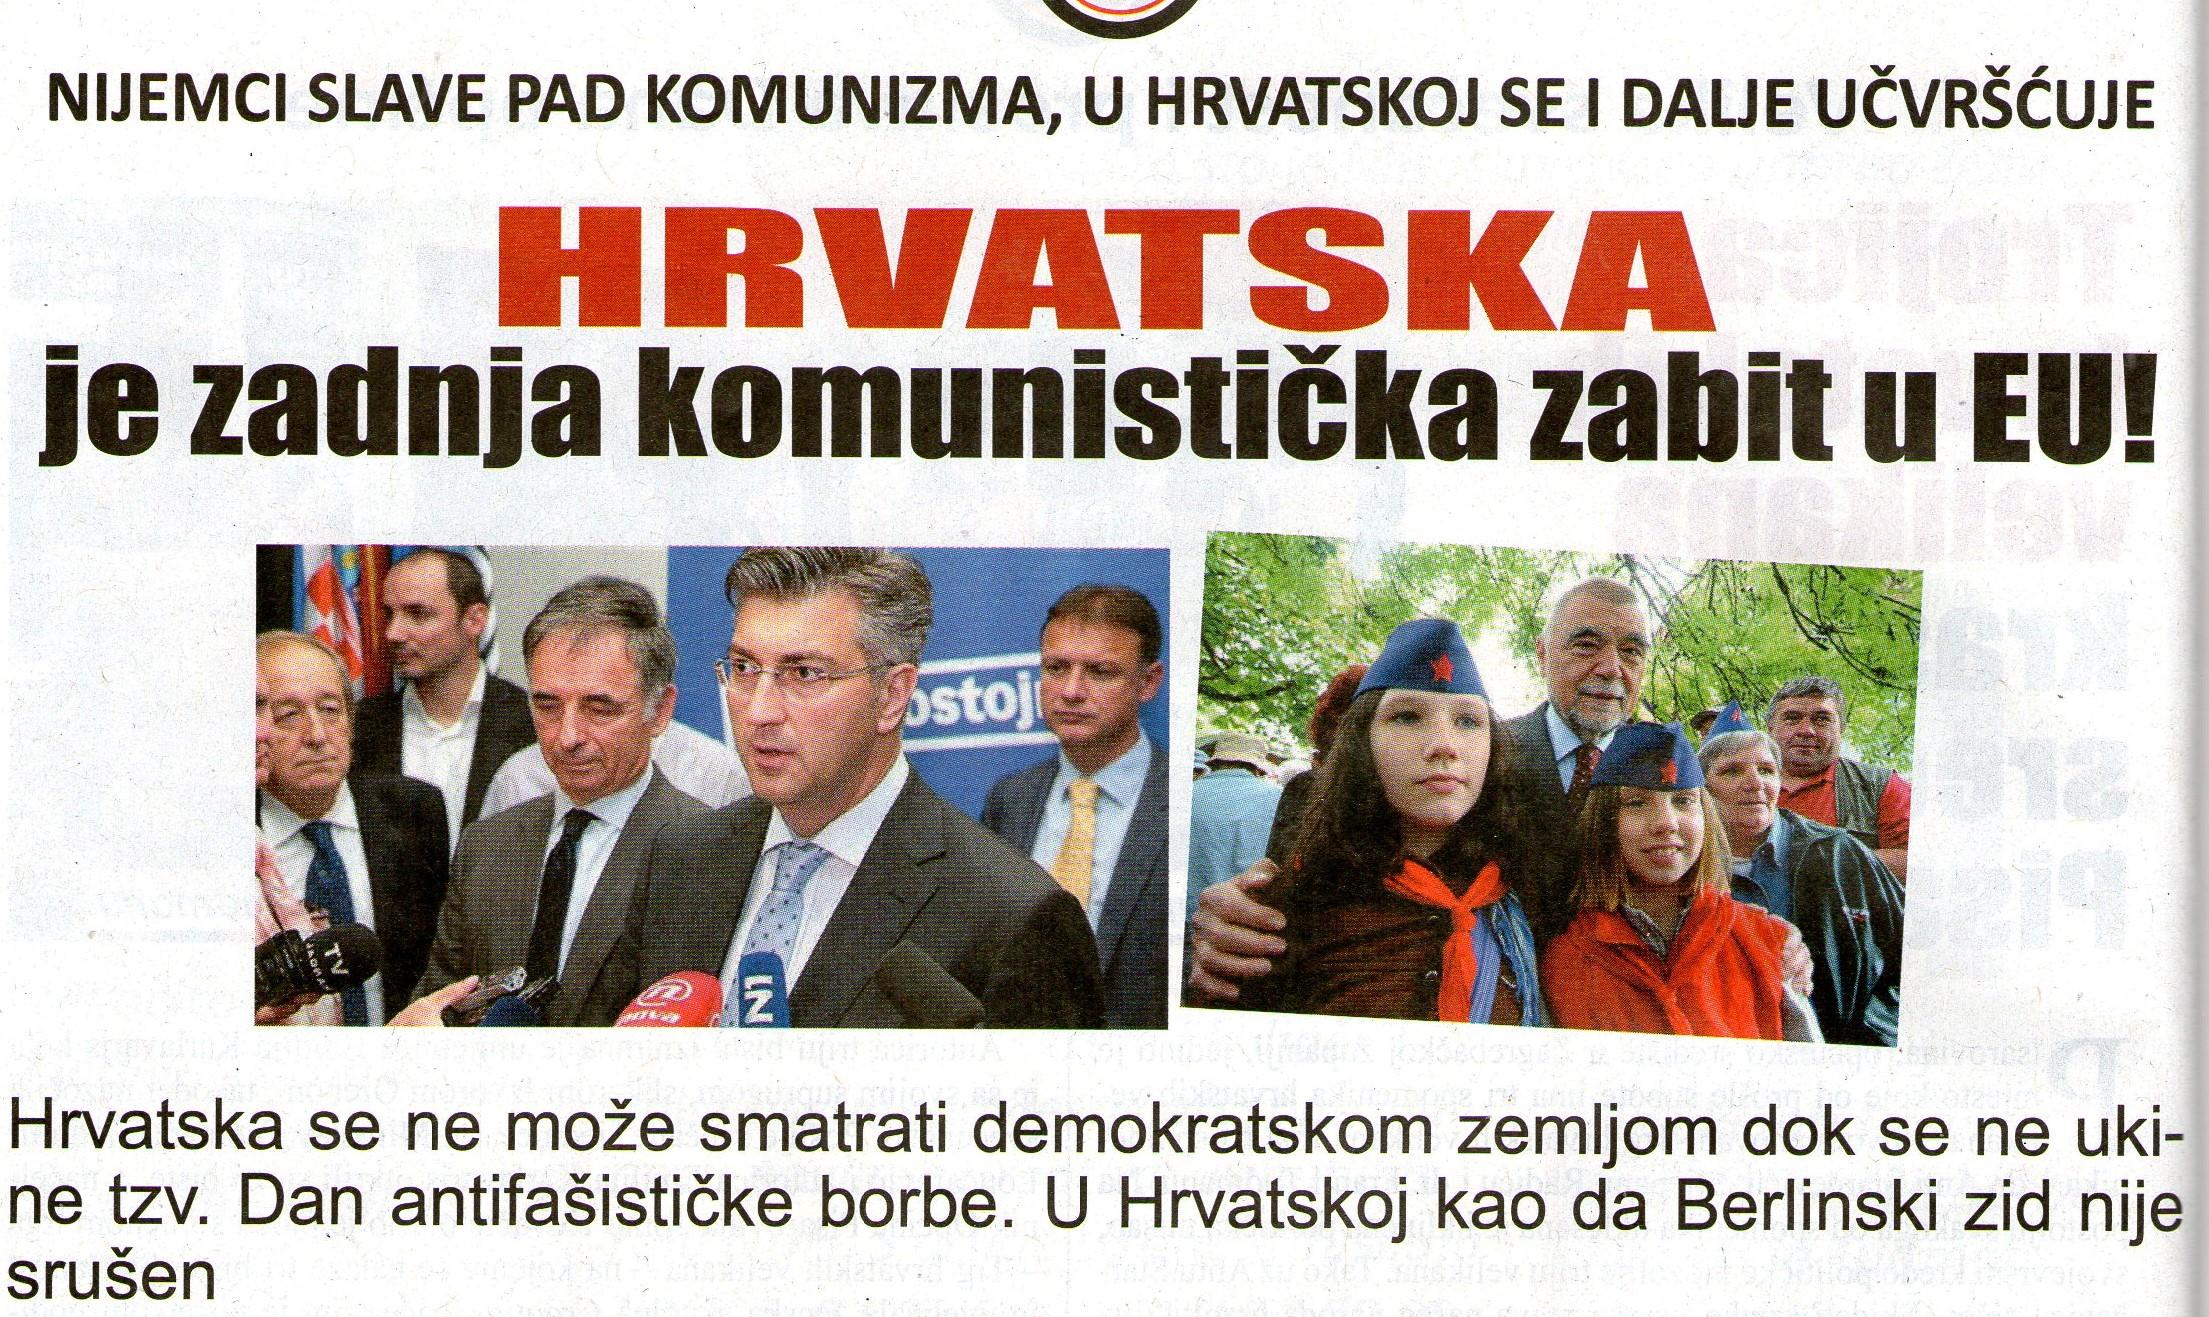 img888-HRVATSKA-komunisti-ka-zabit